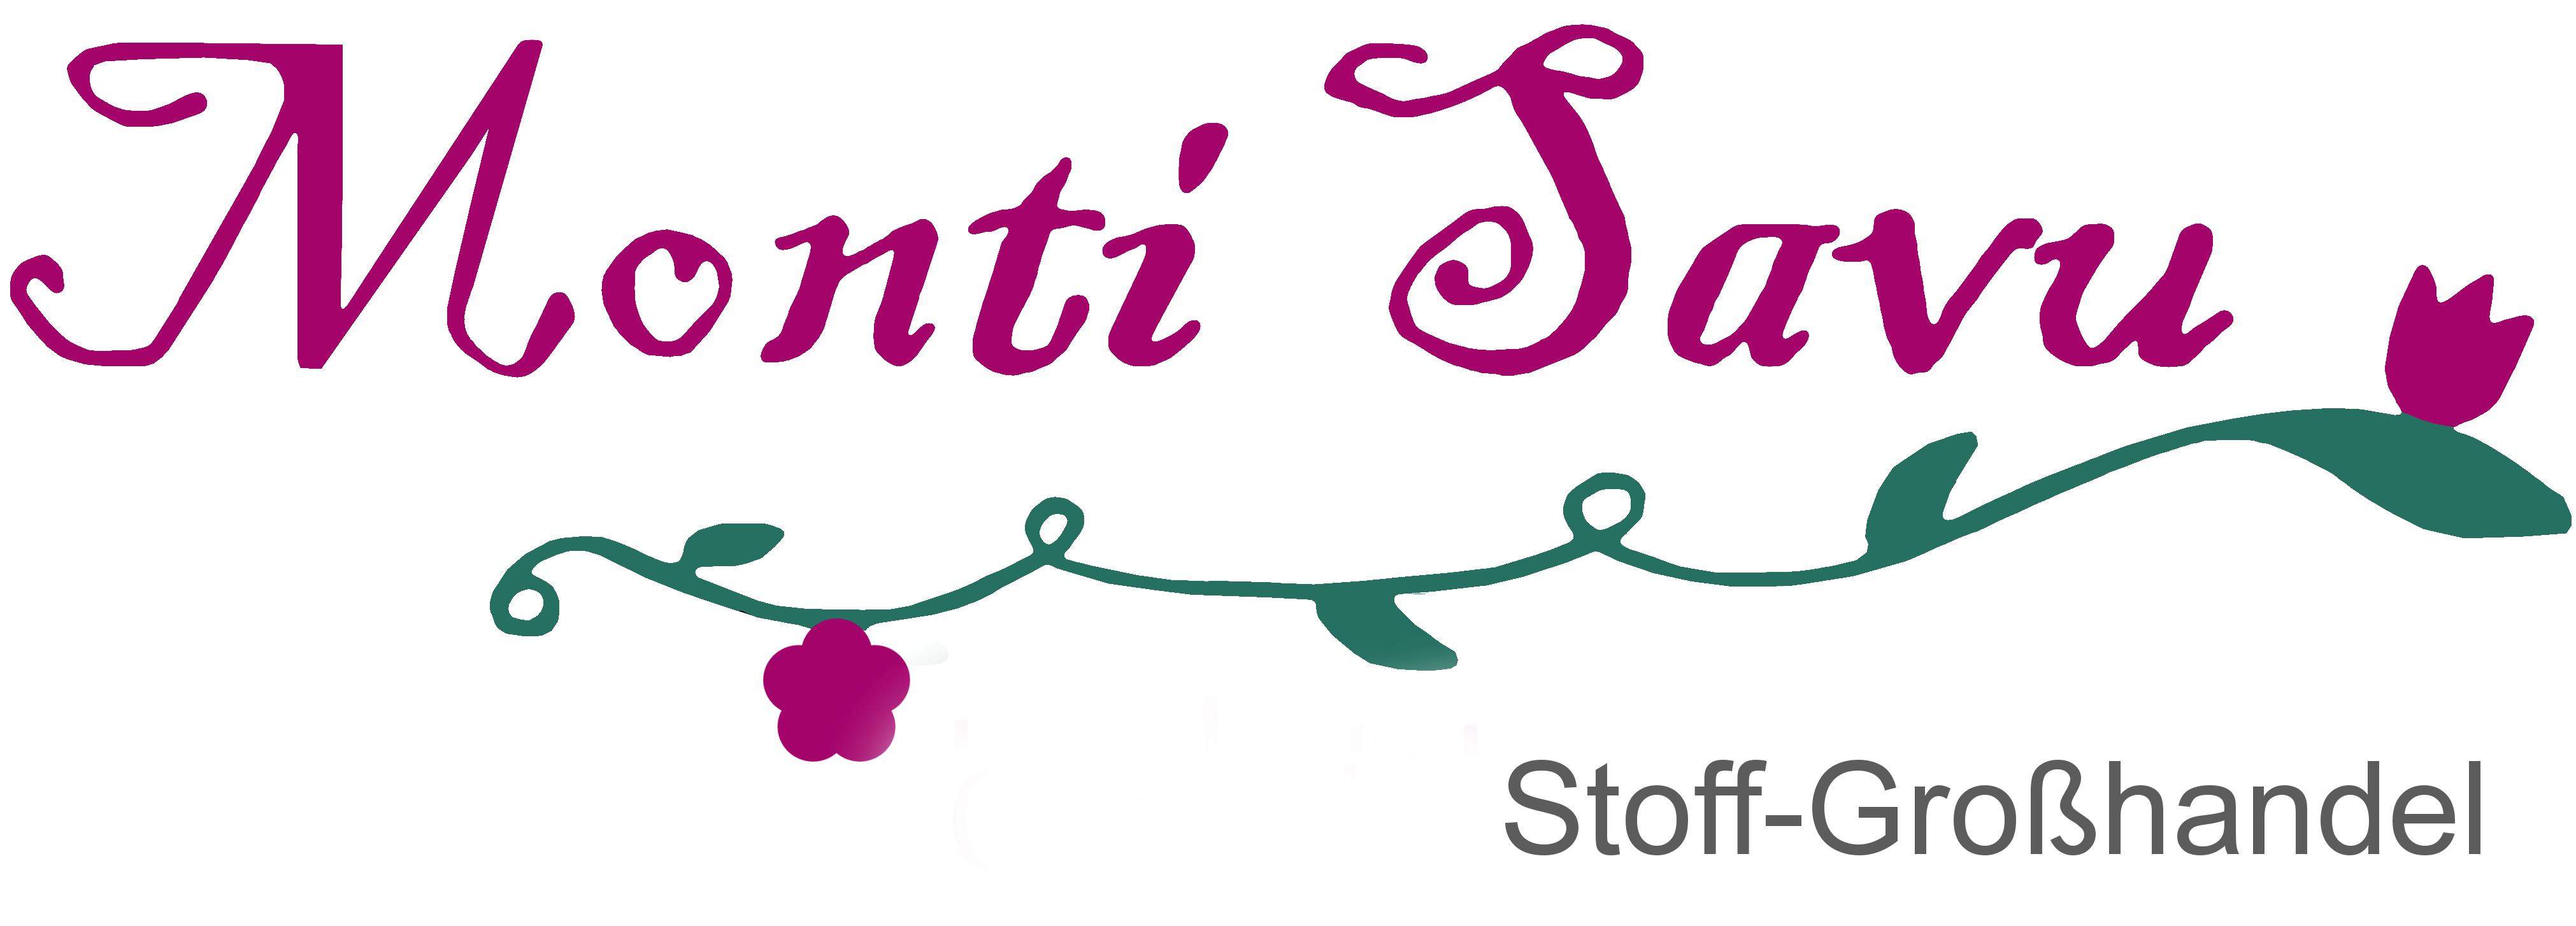 Montisavu Grosshandel-Logo